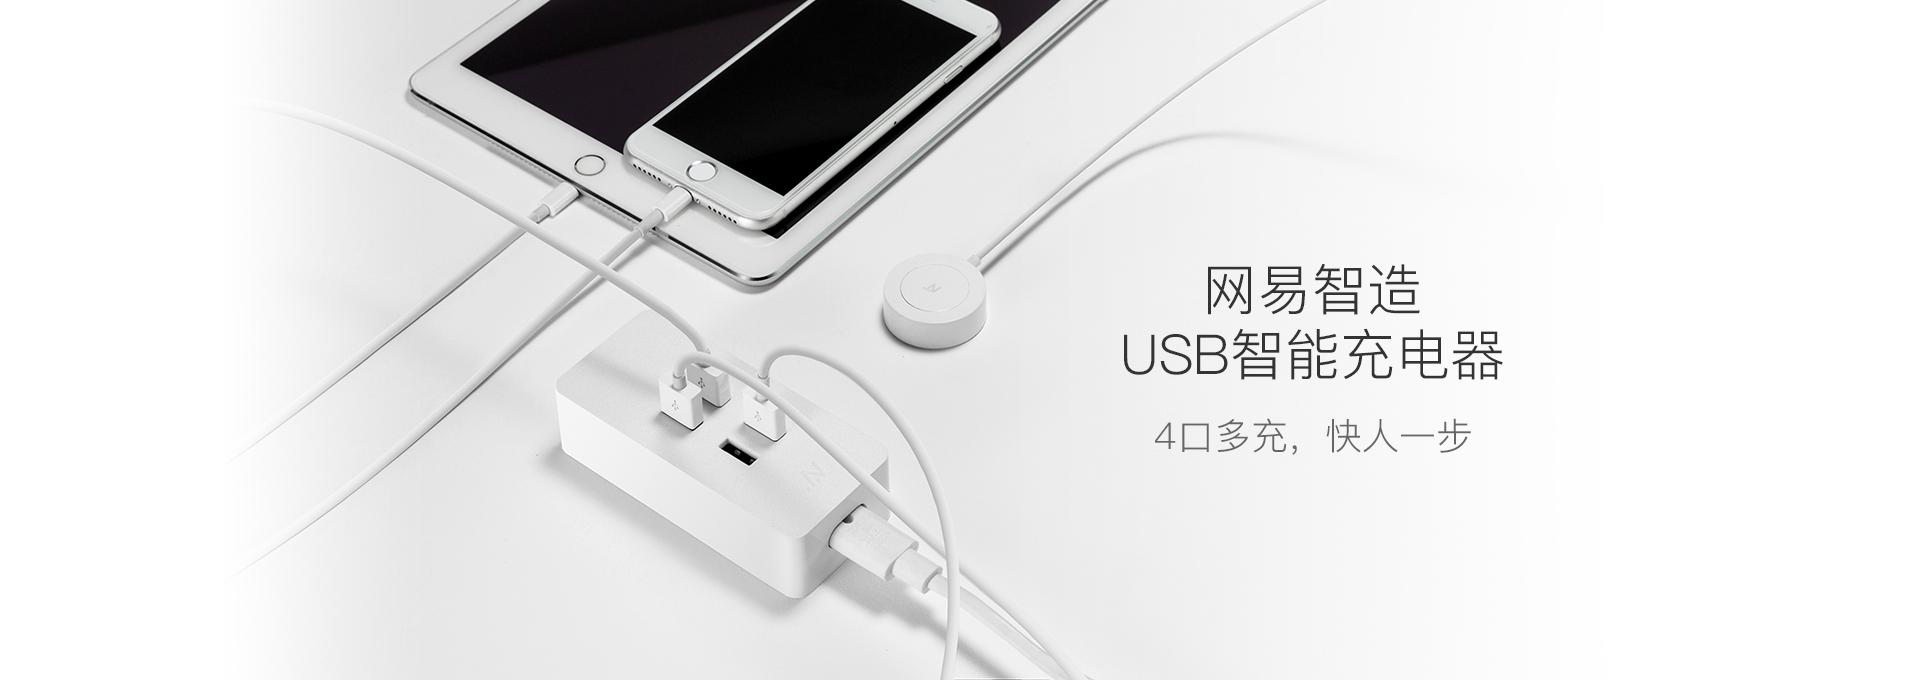 USB智能充电器